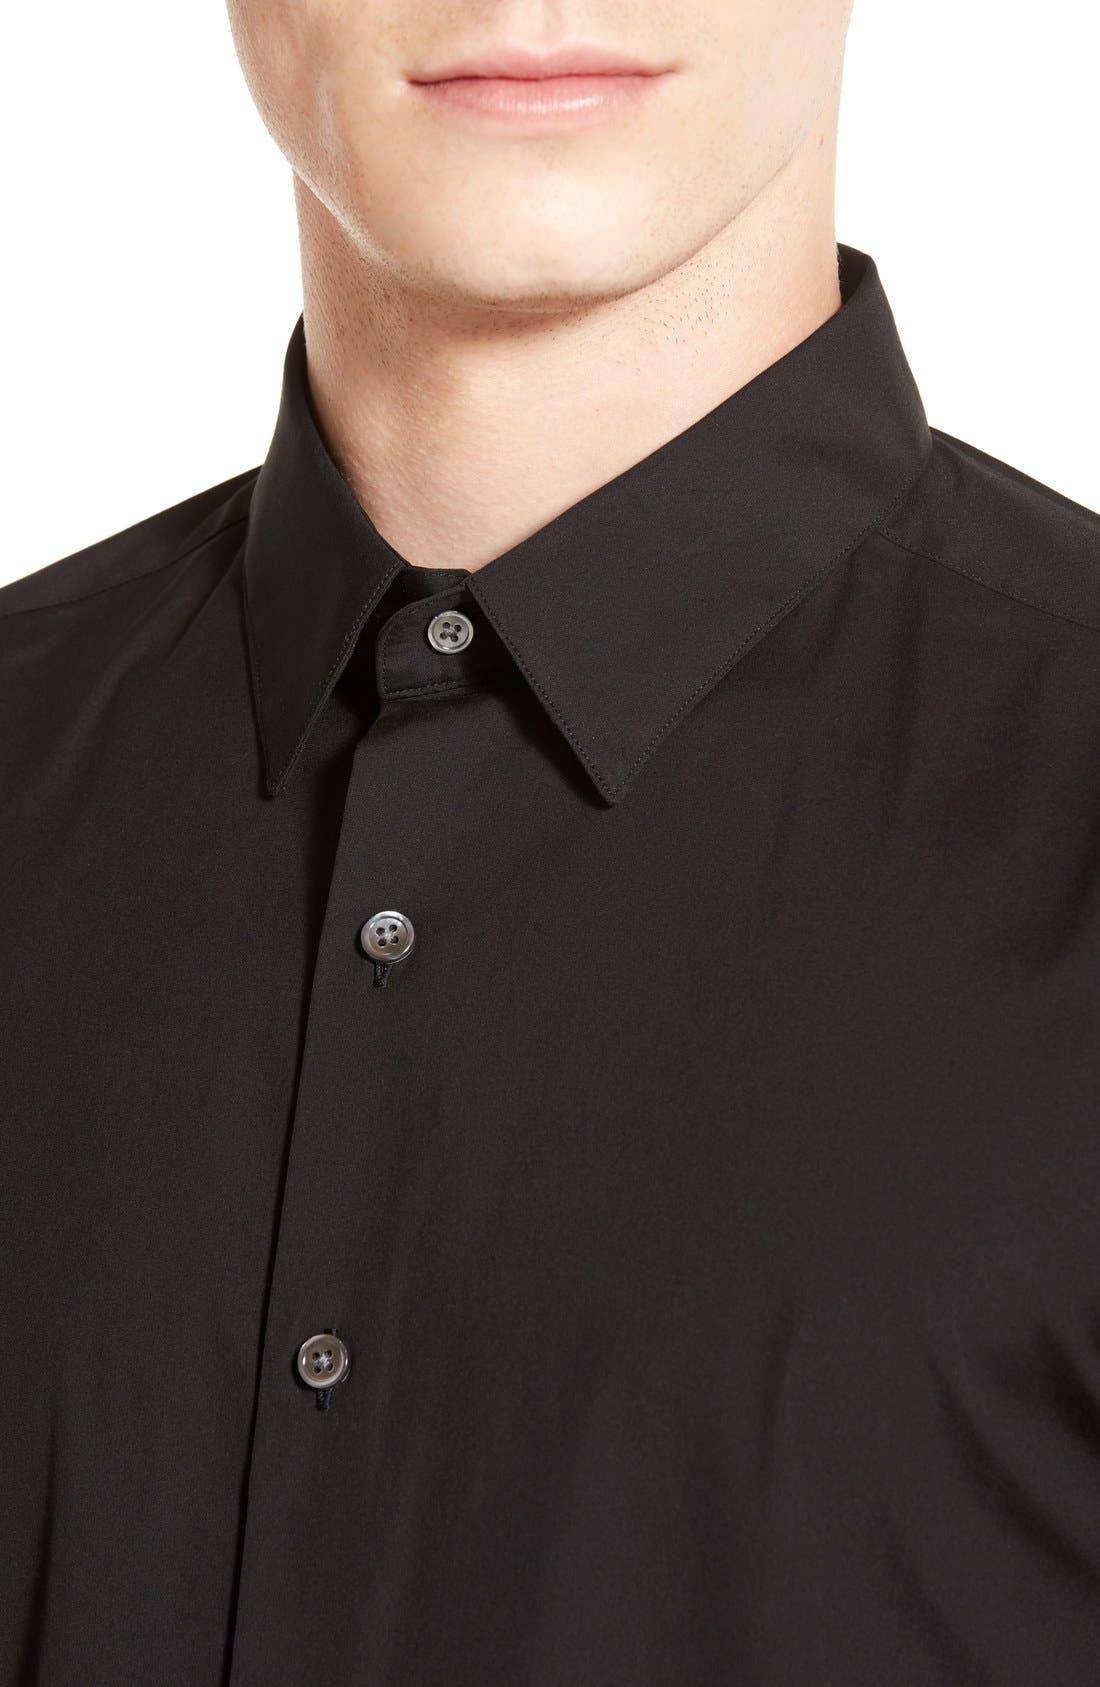 THEORY, 'Sylvain' Trim Fit Long Sleeve Sport Shirt, Alternate thumbnail 5, color, BLACK